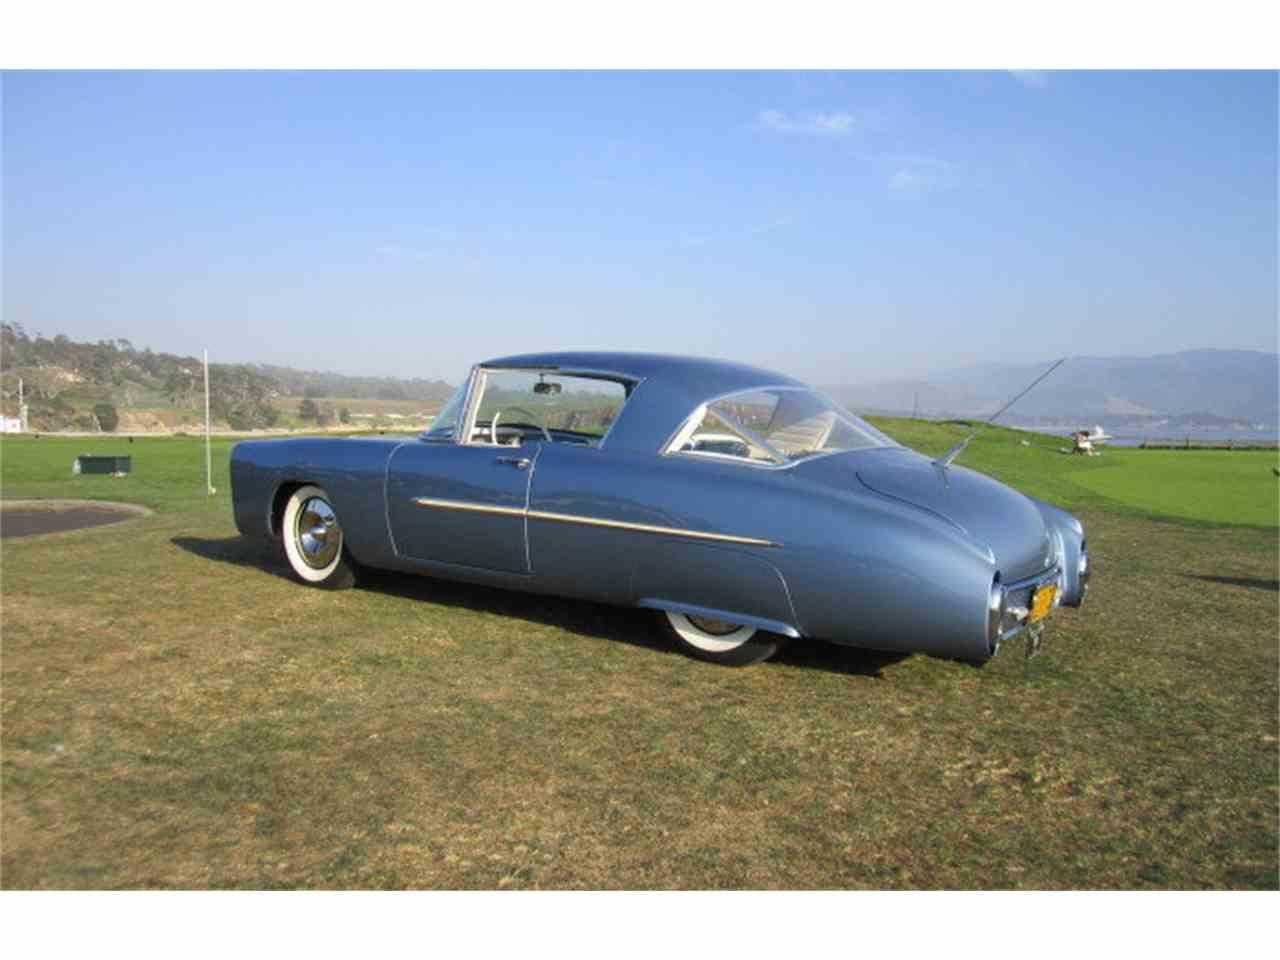 1950 mercury prototype leo lyons coupe for sale cc 1062782. Black Bedroom Furniture Sets. Home Design Ideas